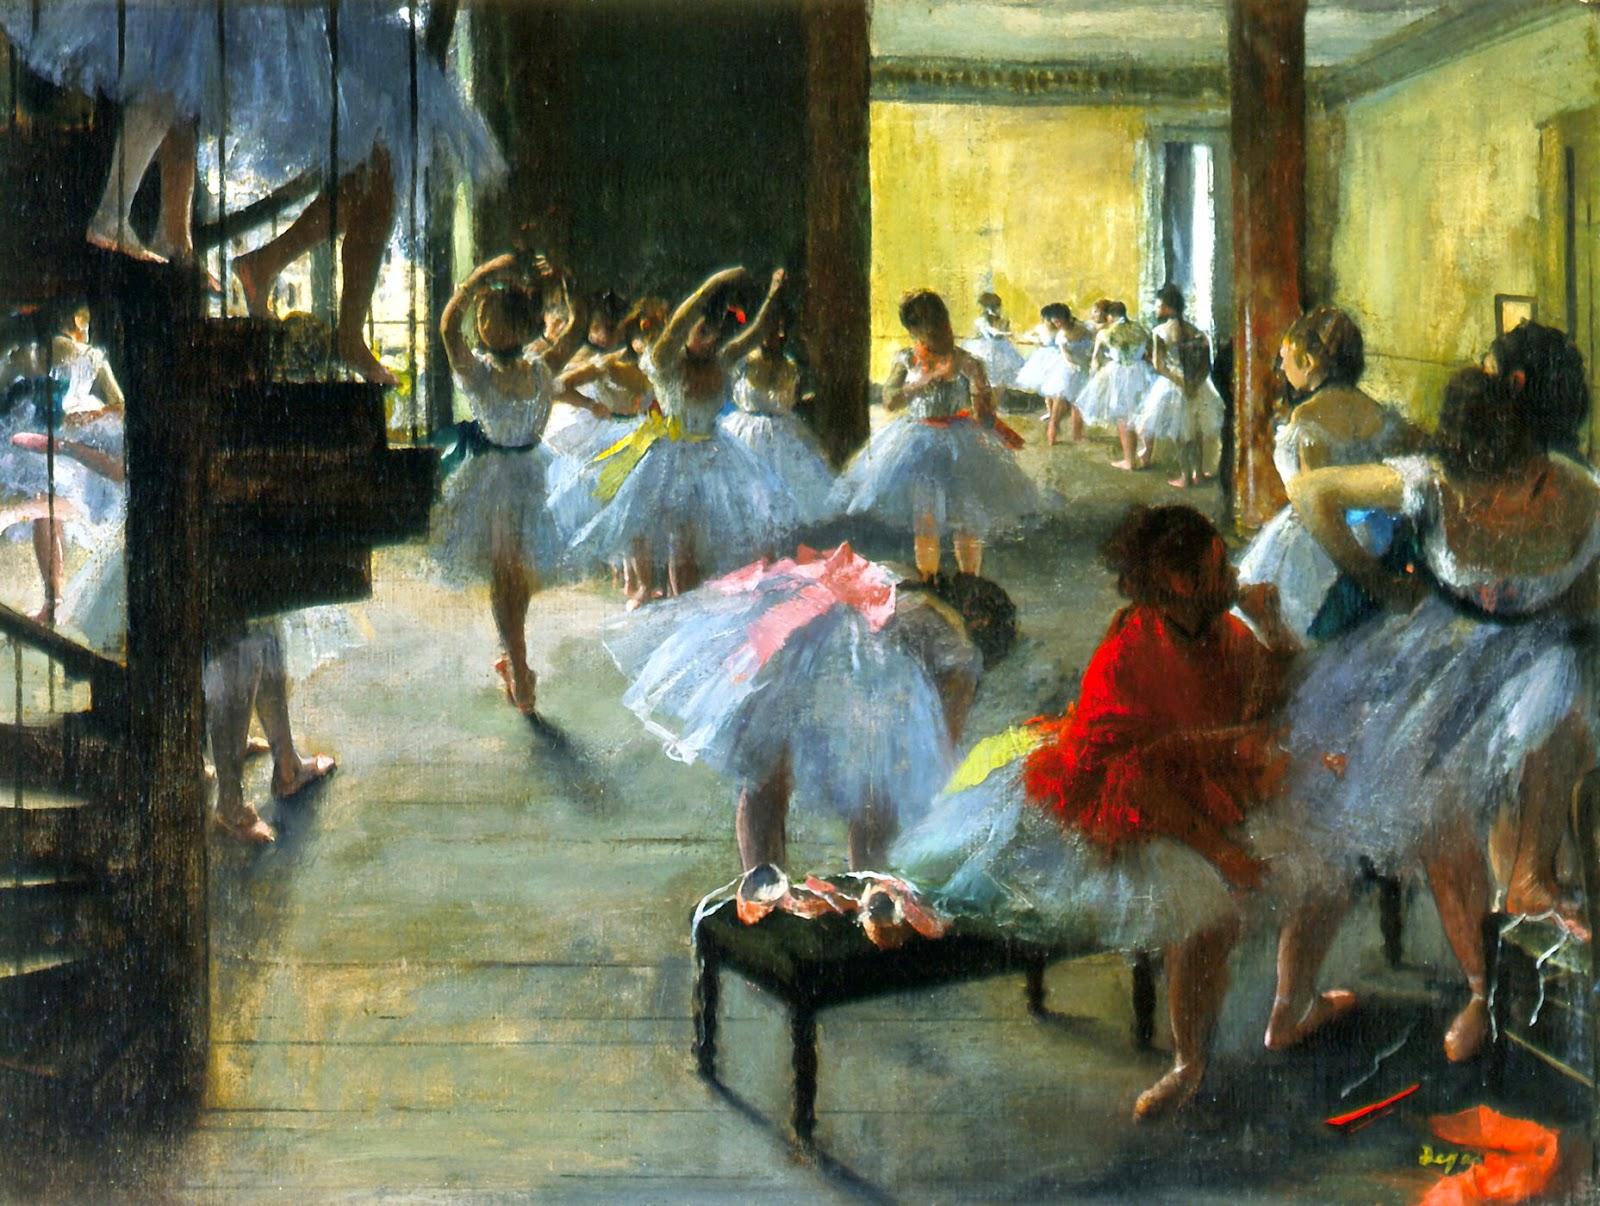 Escola de Dança - Edgar Degas e suas principais pinturas ~ O Pintor de Bailarinas